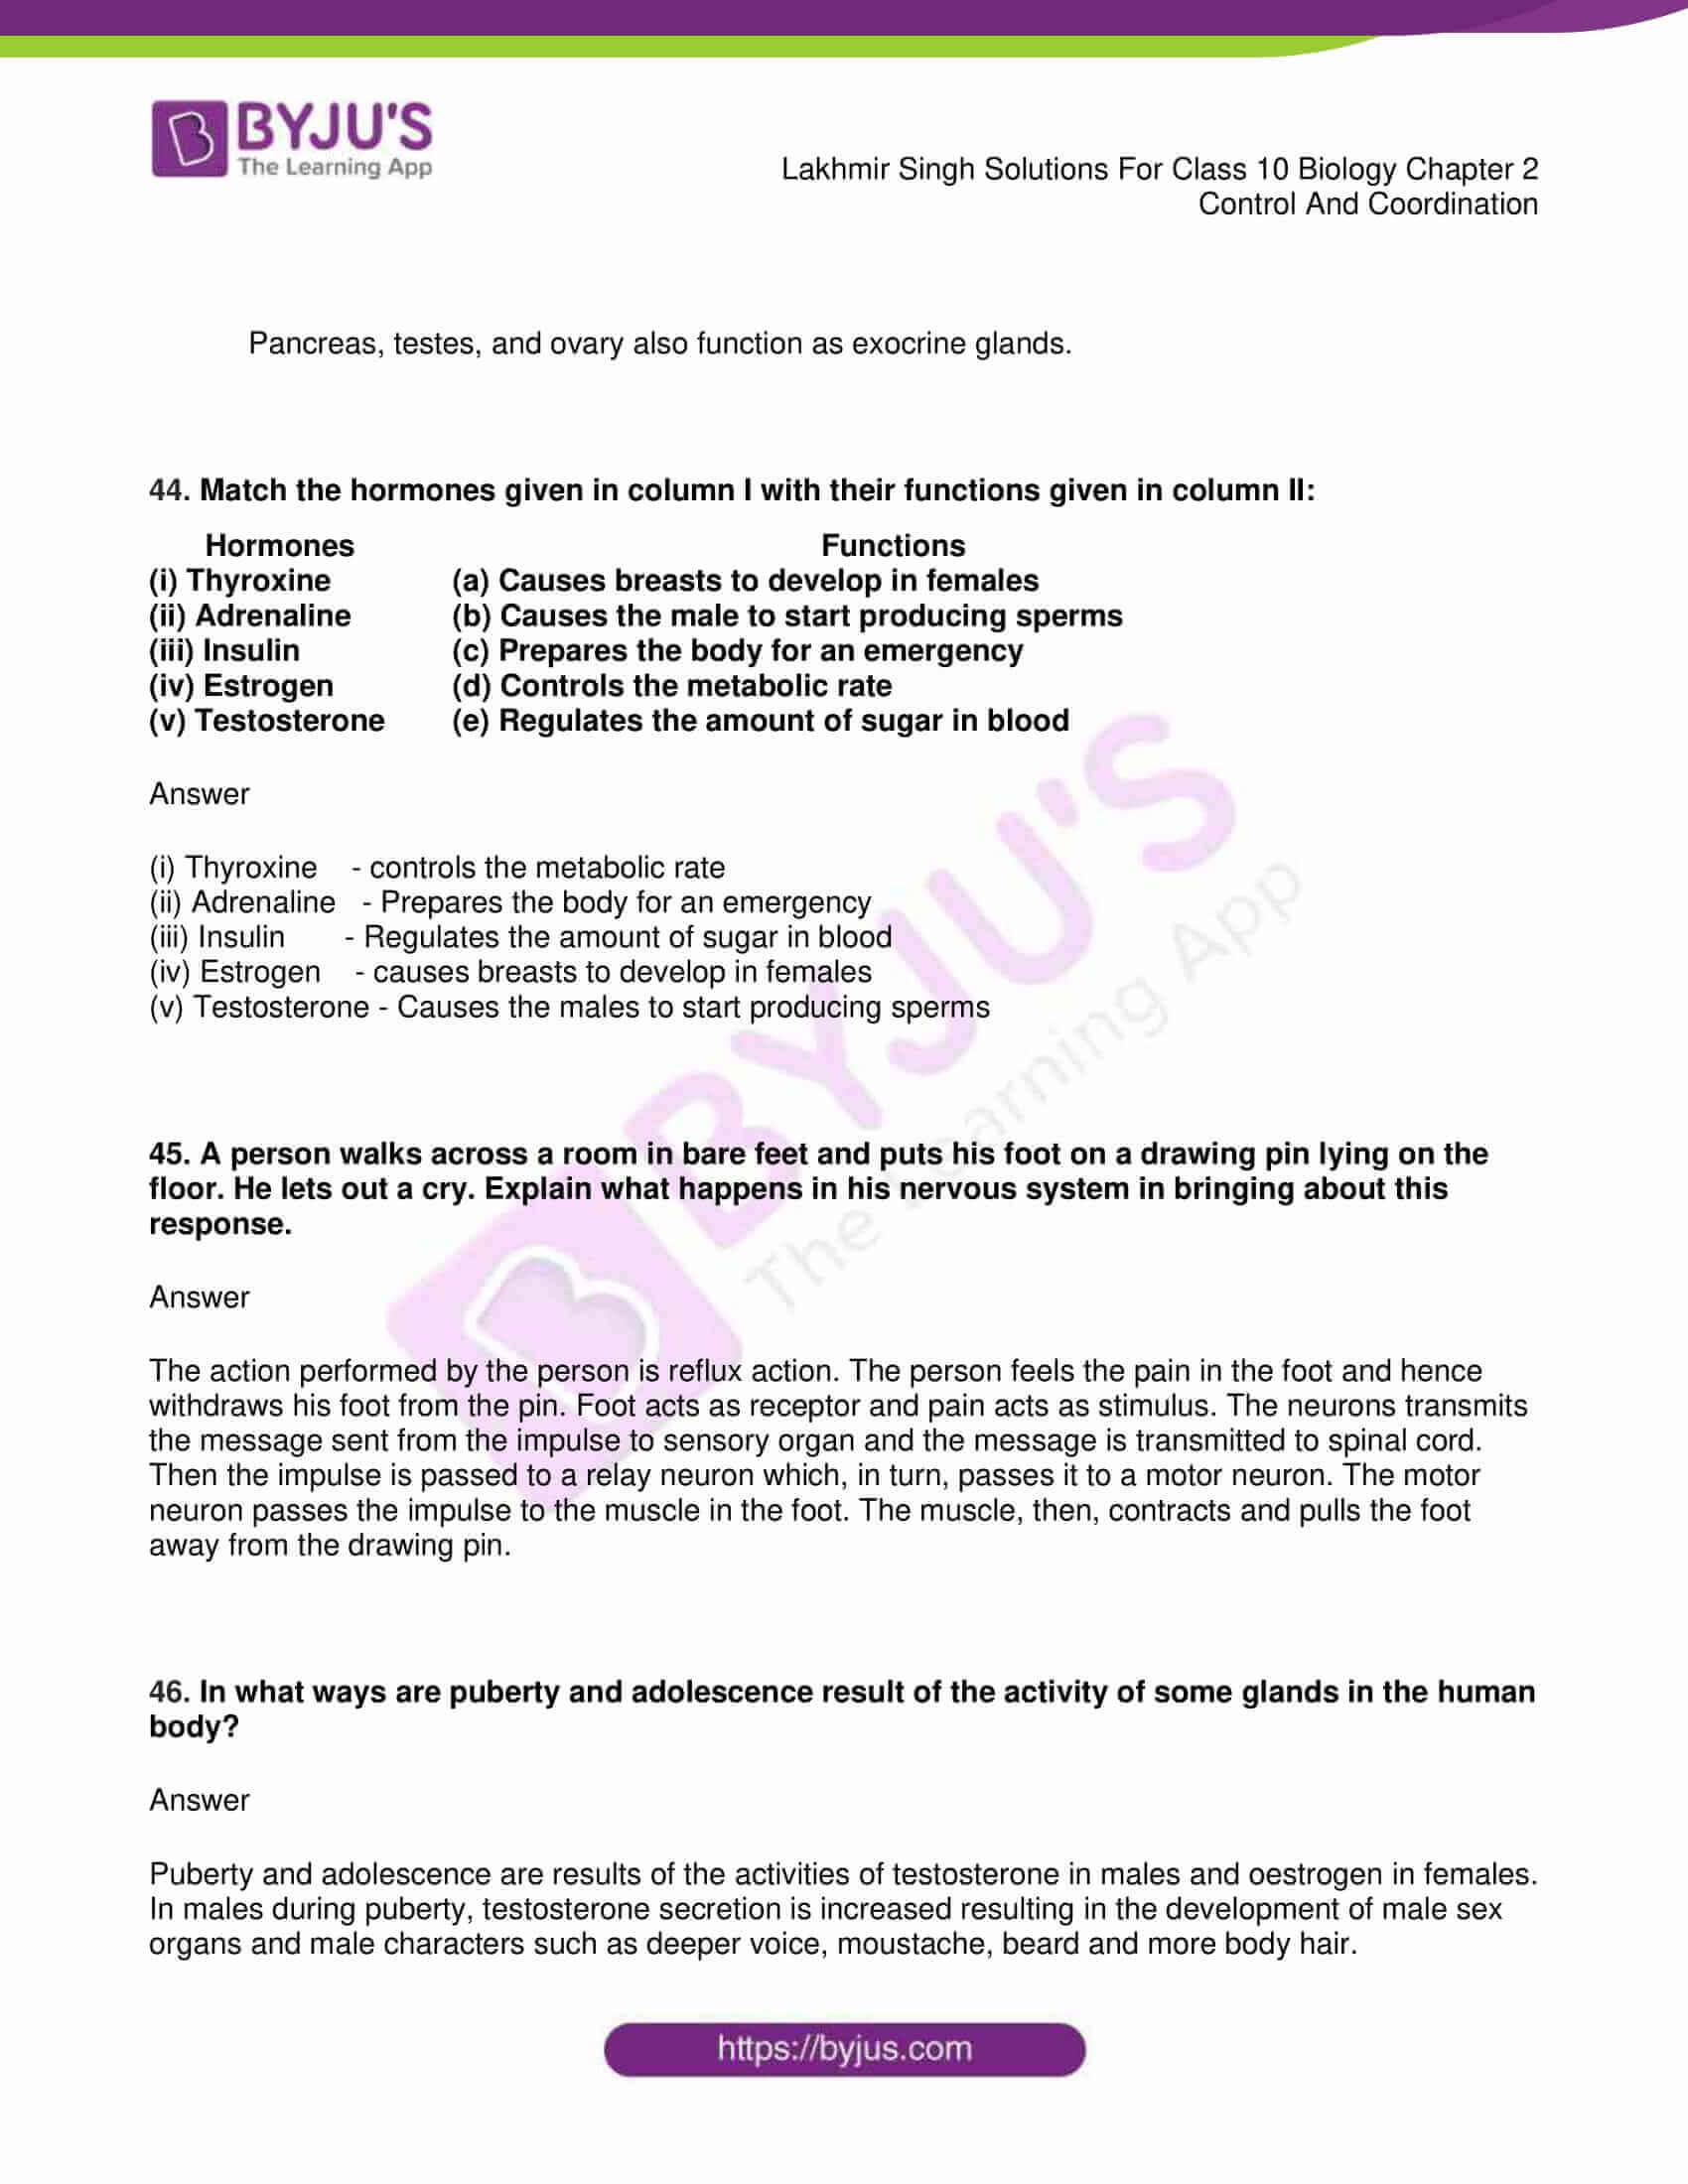 lakhmir singh sol class 10 biology chapter 2 33